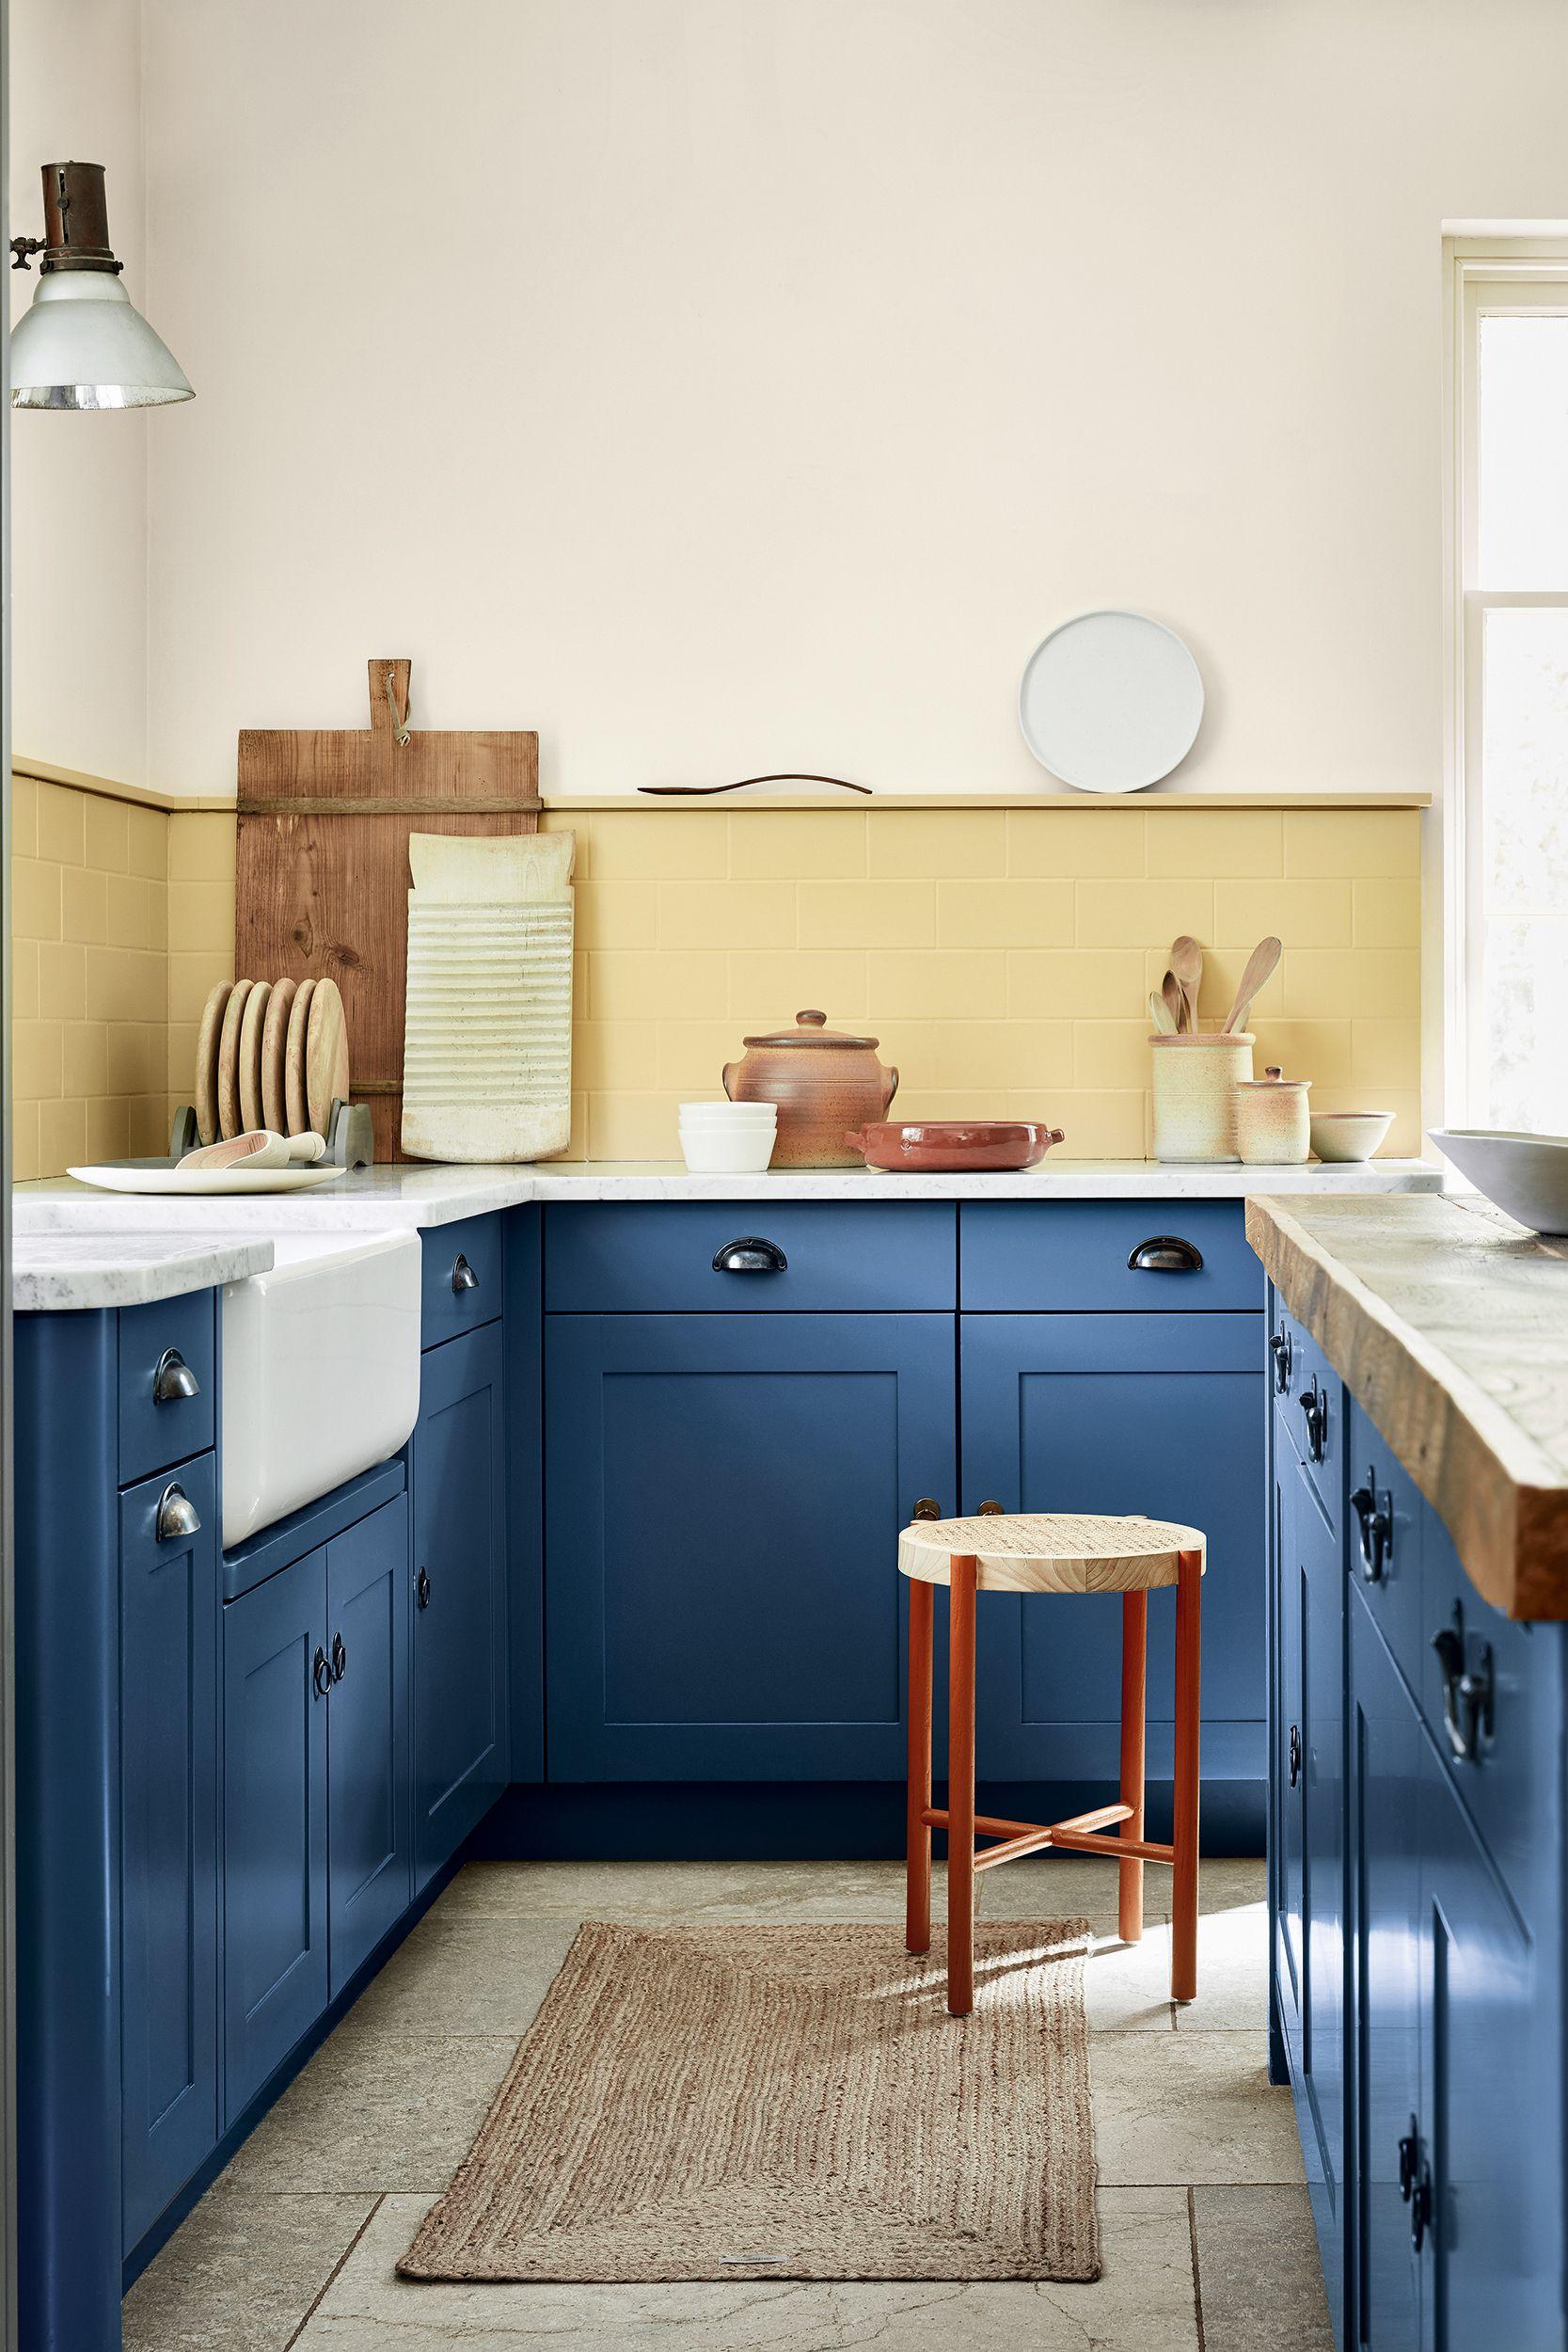 Diy Kitchen Worktop Ideas To Update Your Kitchen Quickly And